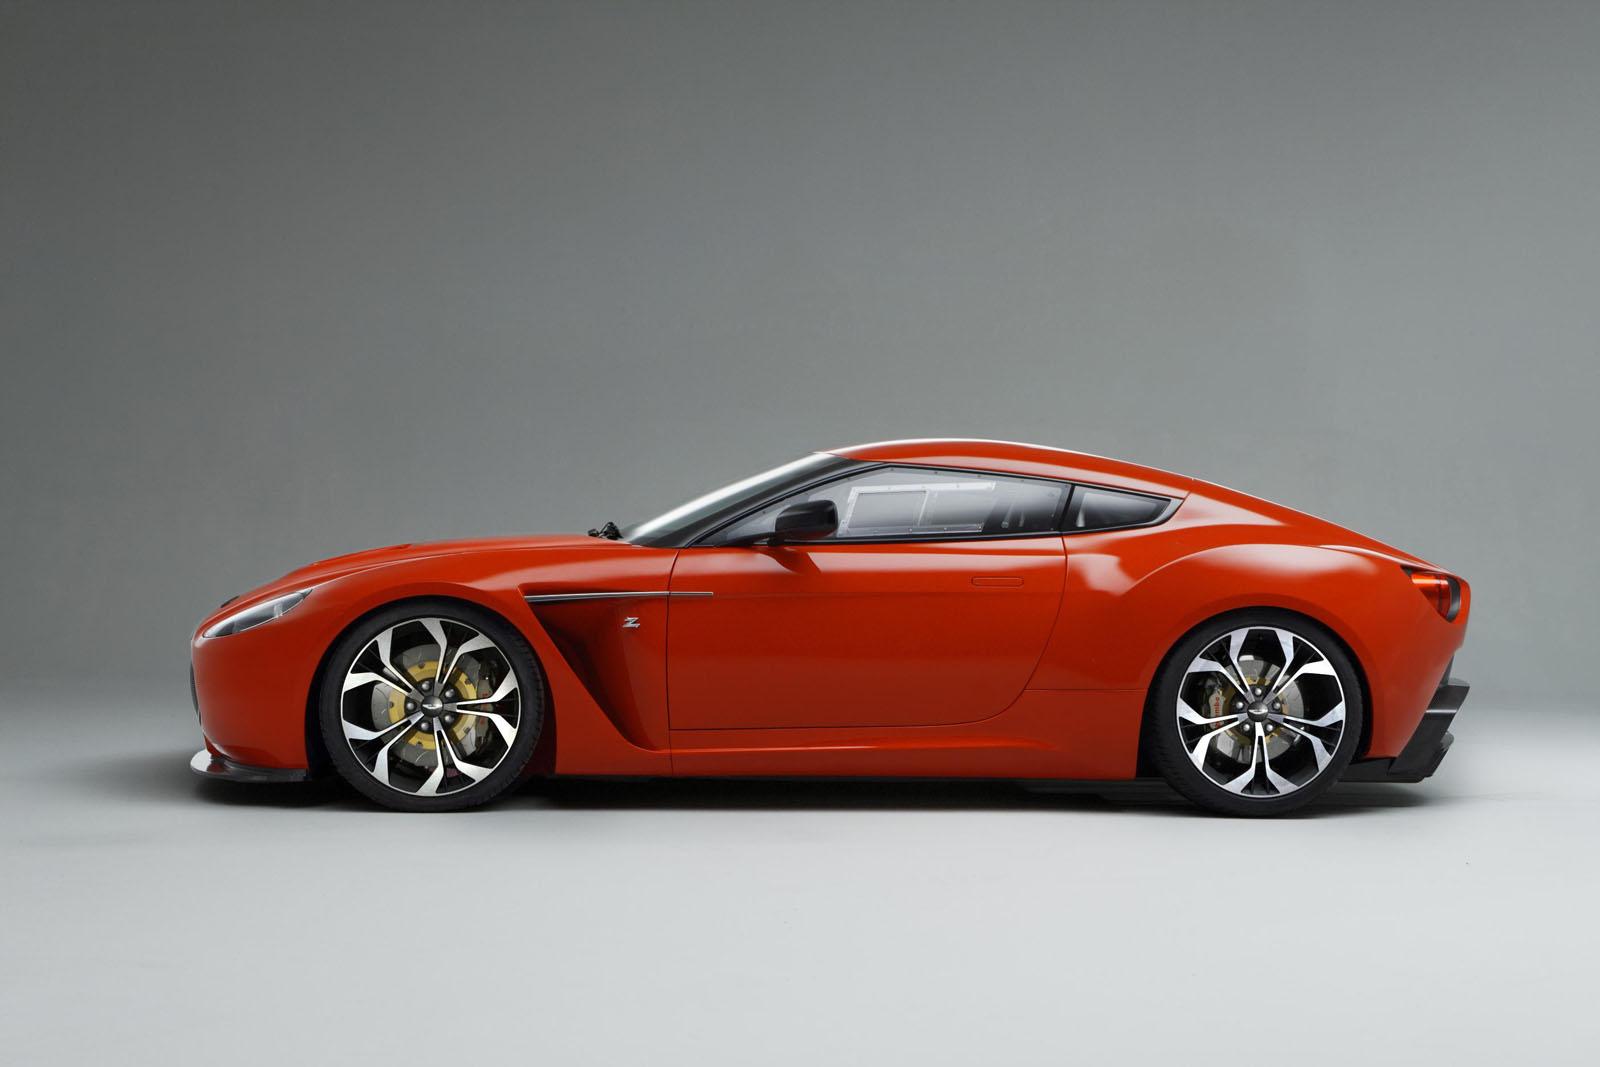 car models com 2012 aston martin v12 zagato. Black Bedroom Furniture Sets. Home Design Ideas